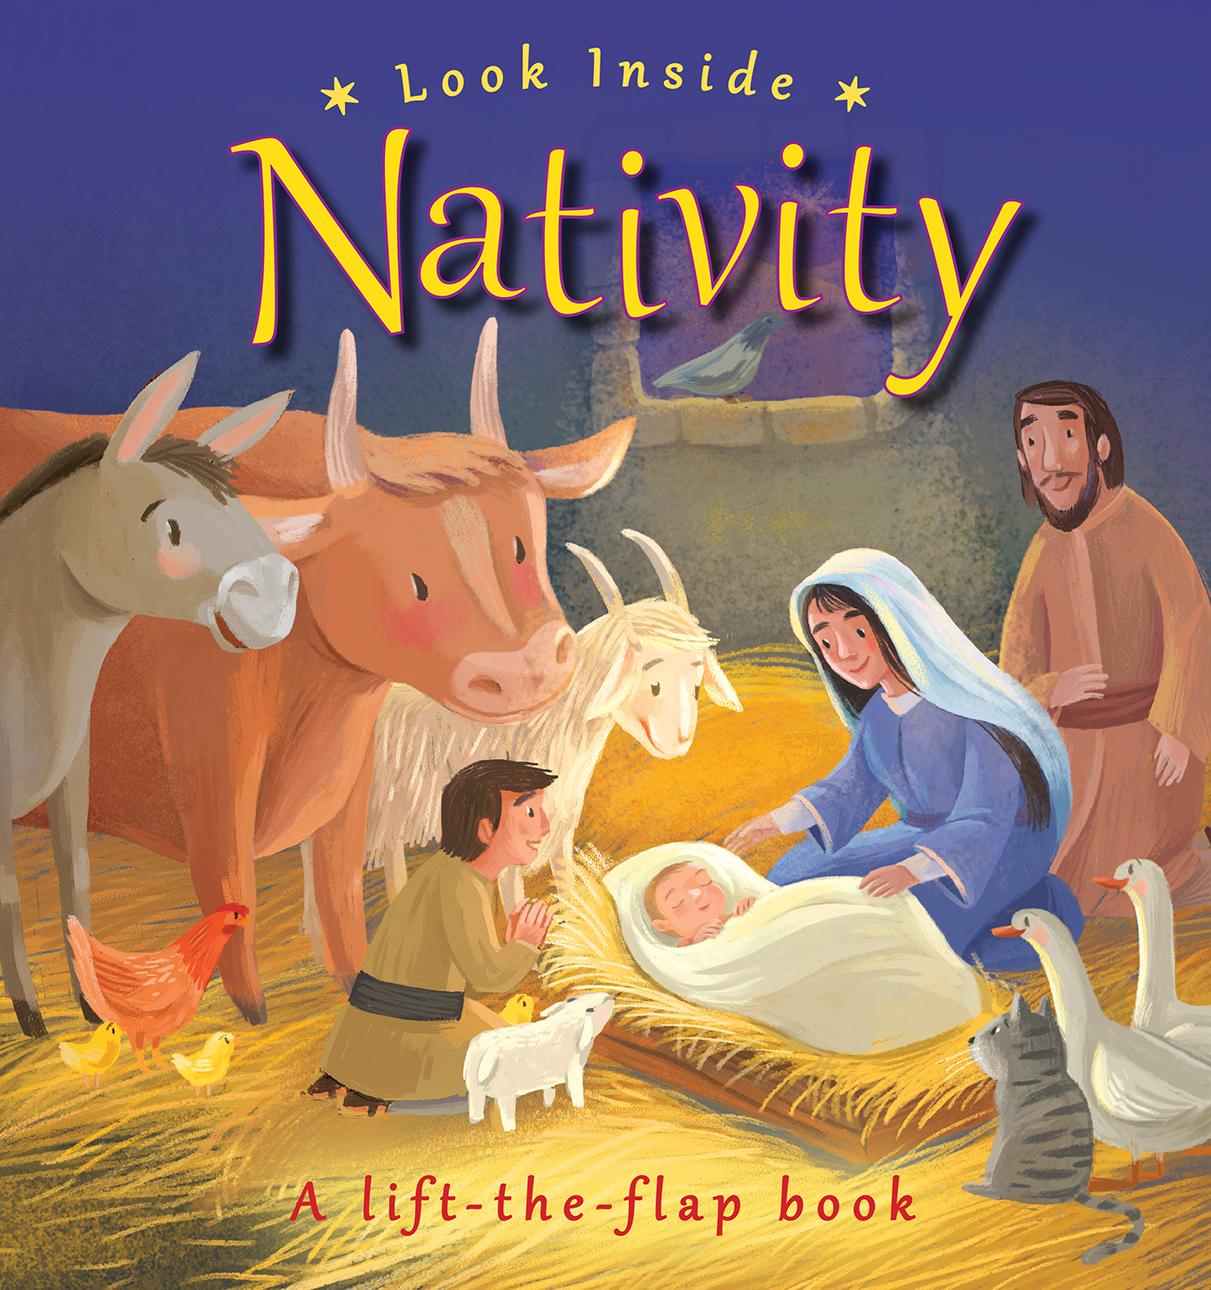 Look Inside Nativity